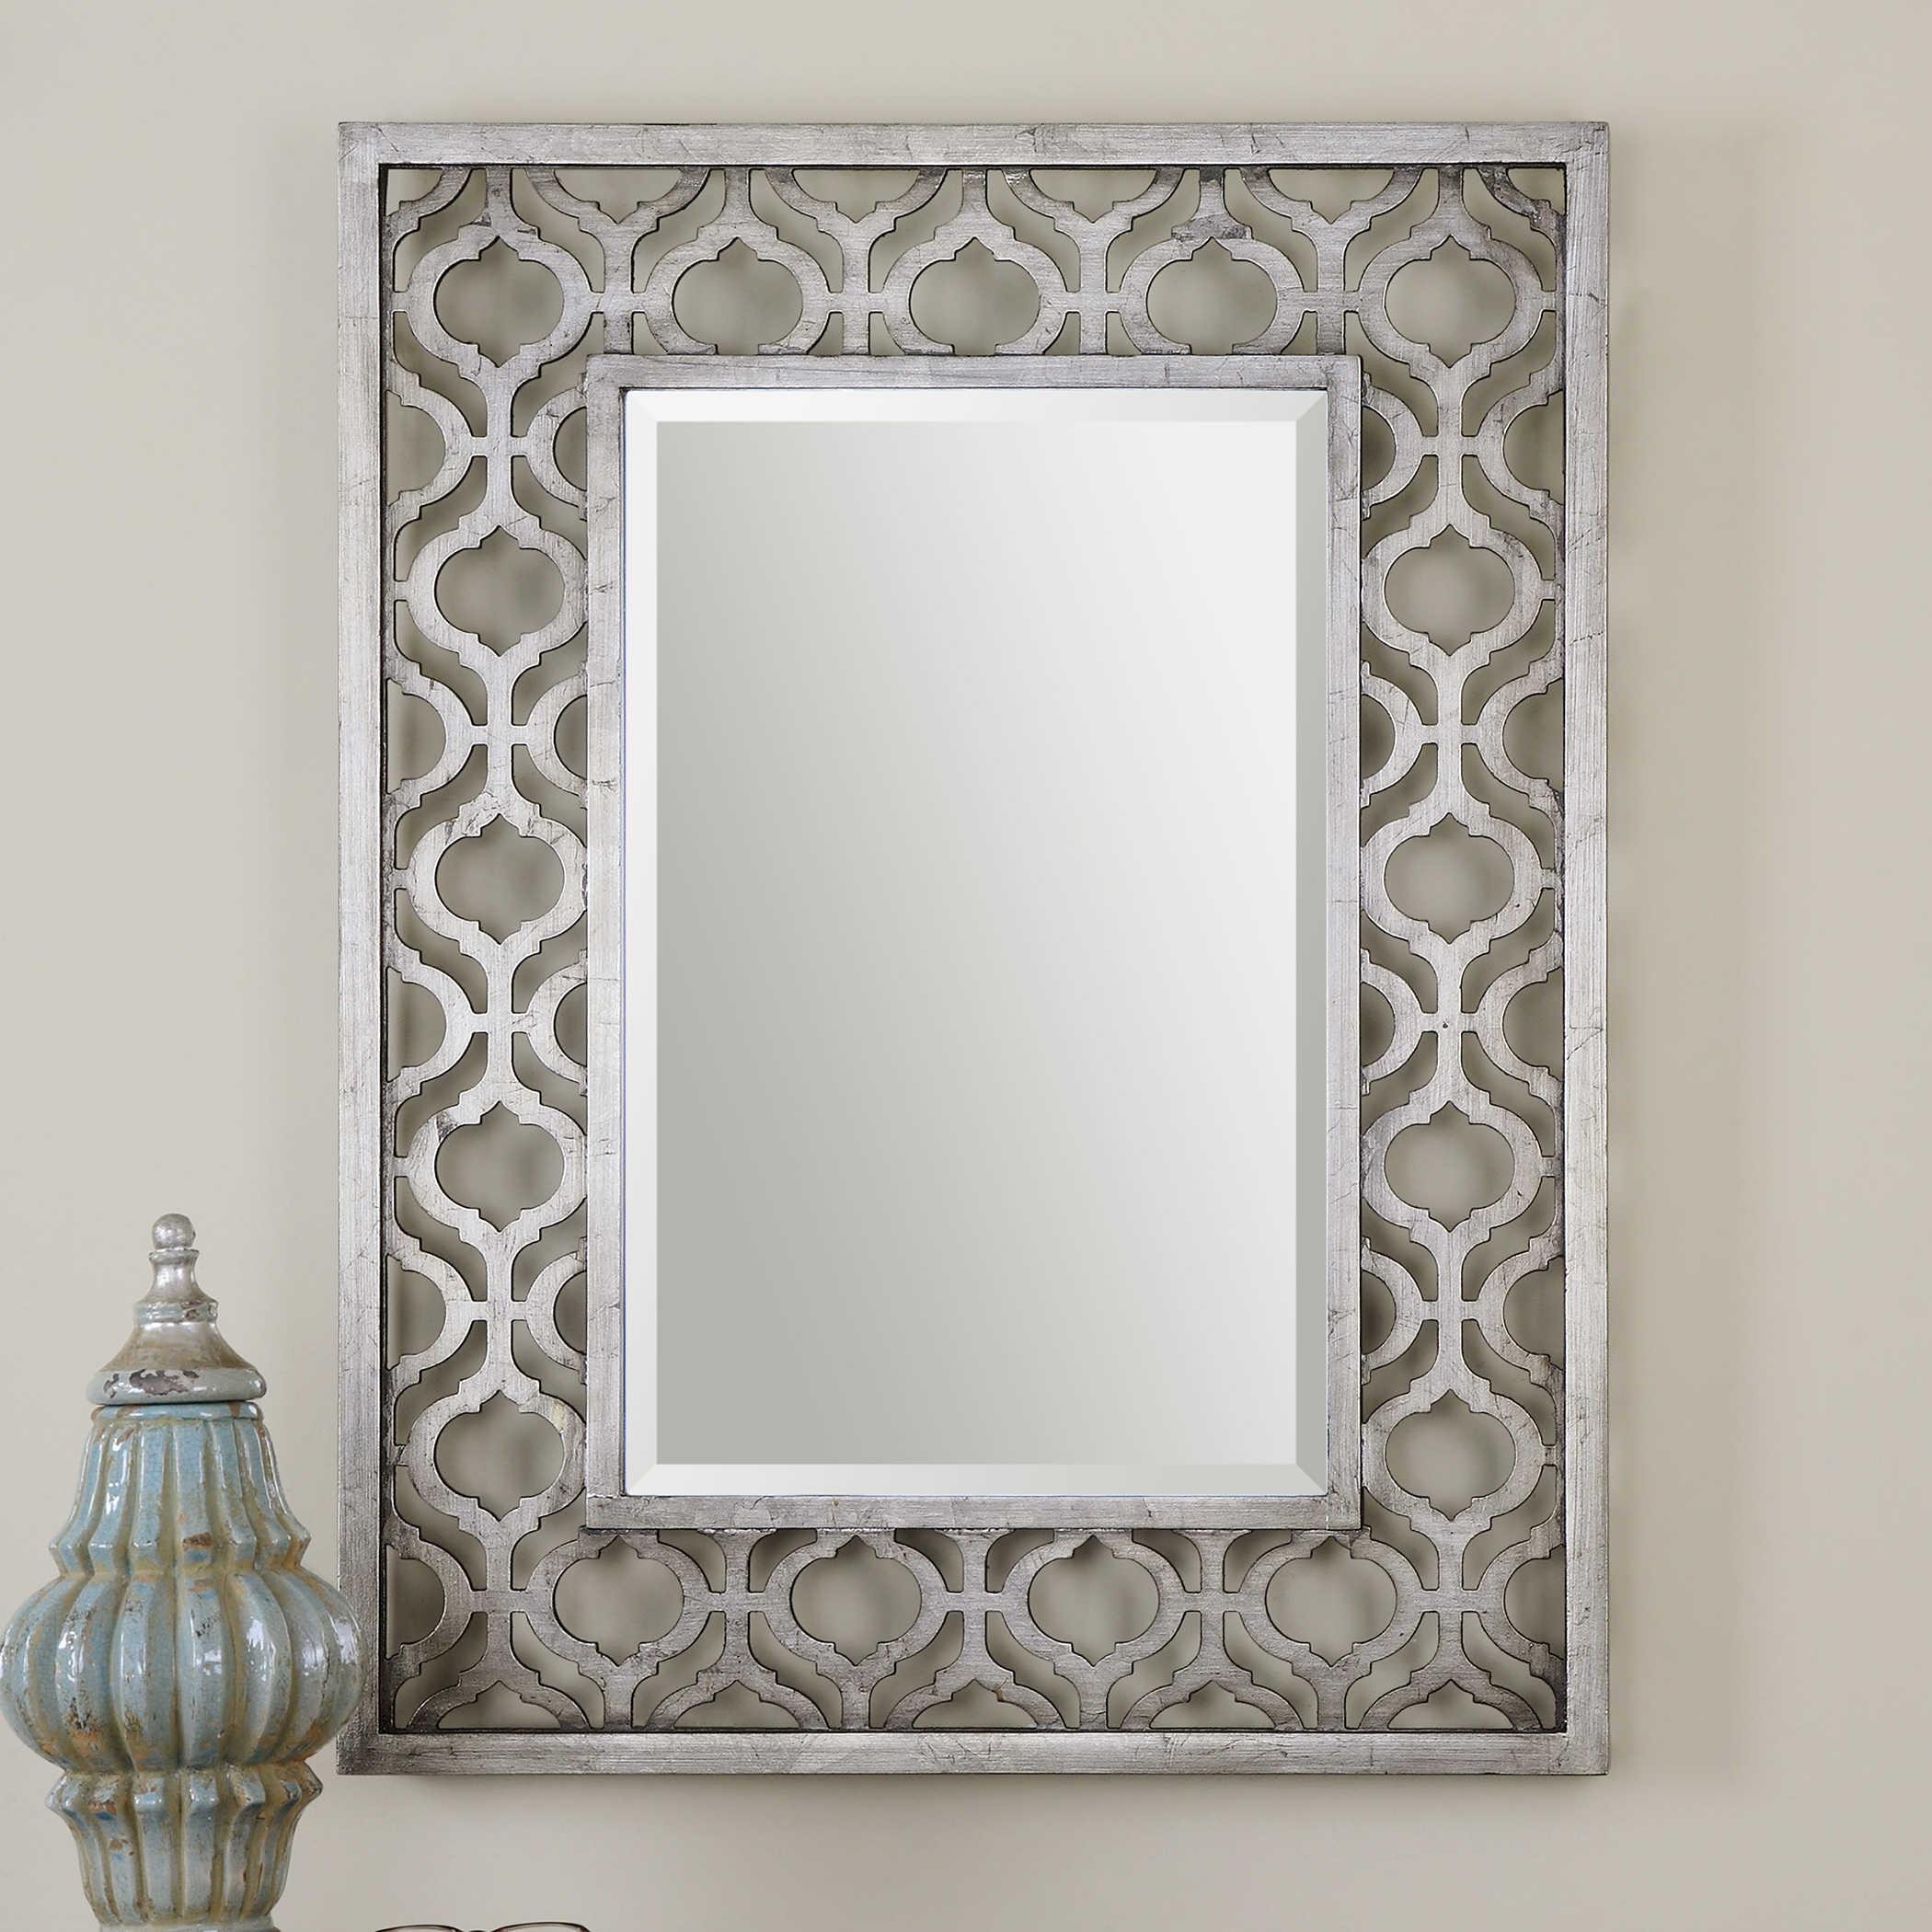 Bolo Mirror – $395.00